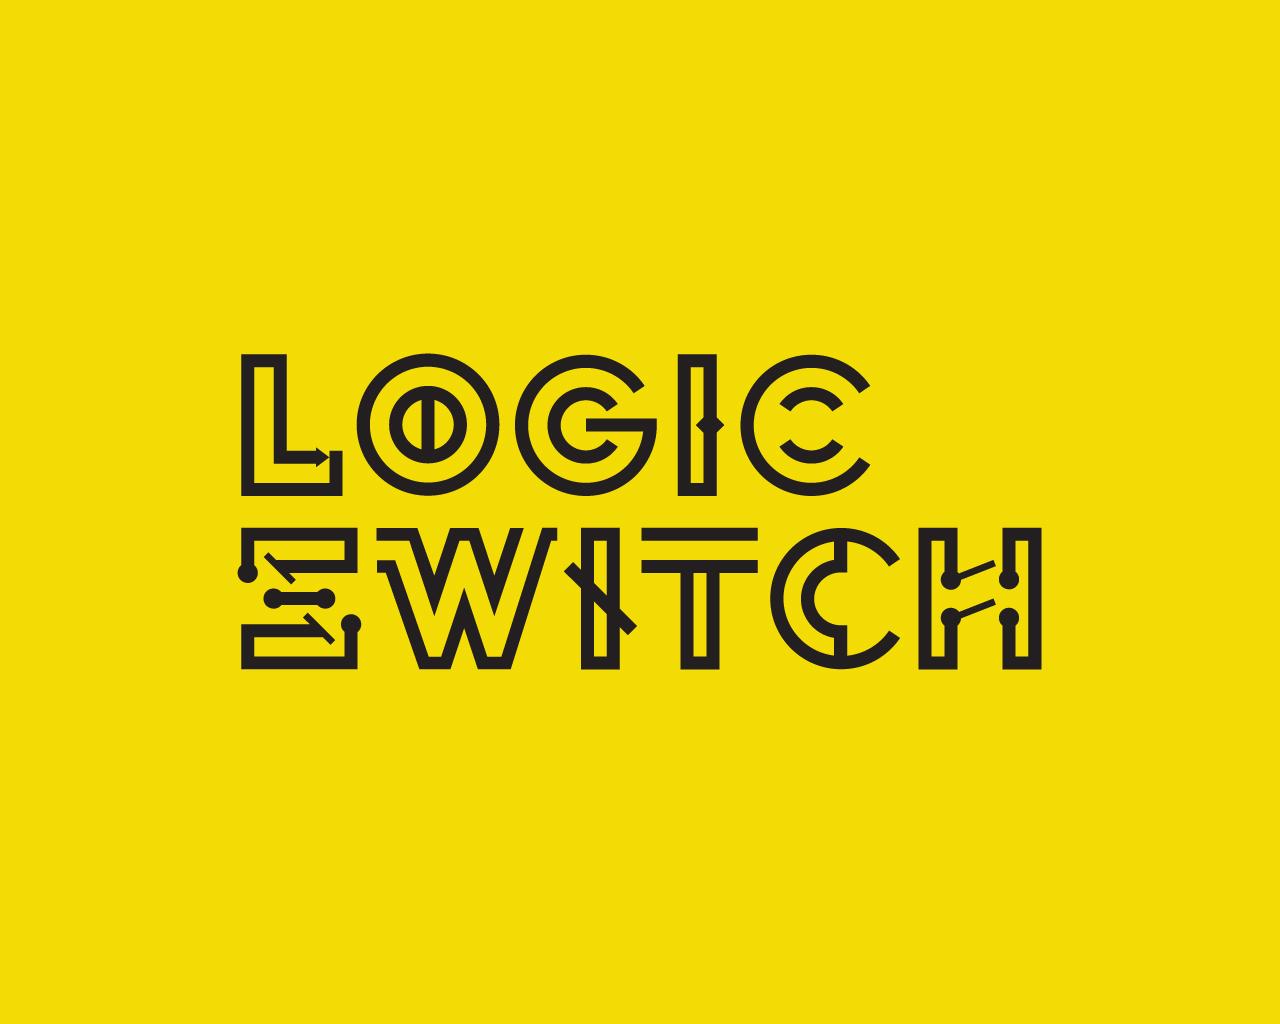 Logic Switch